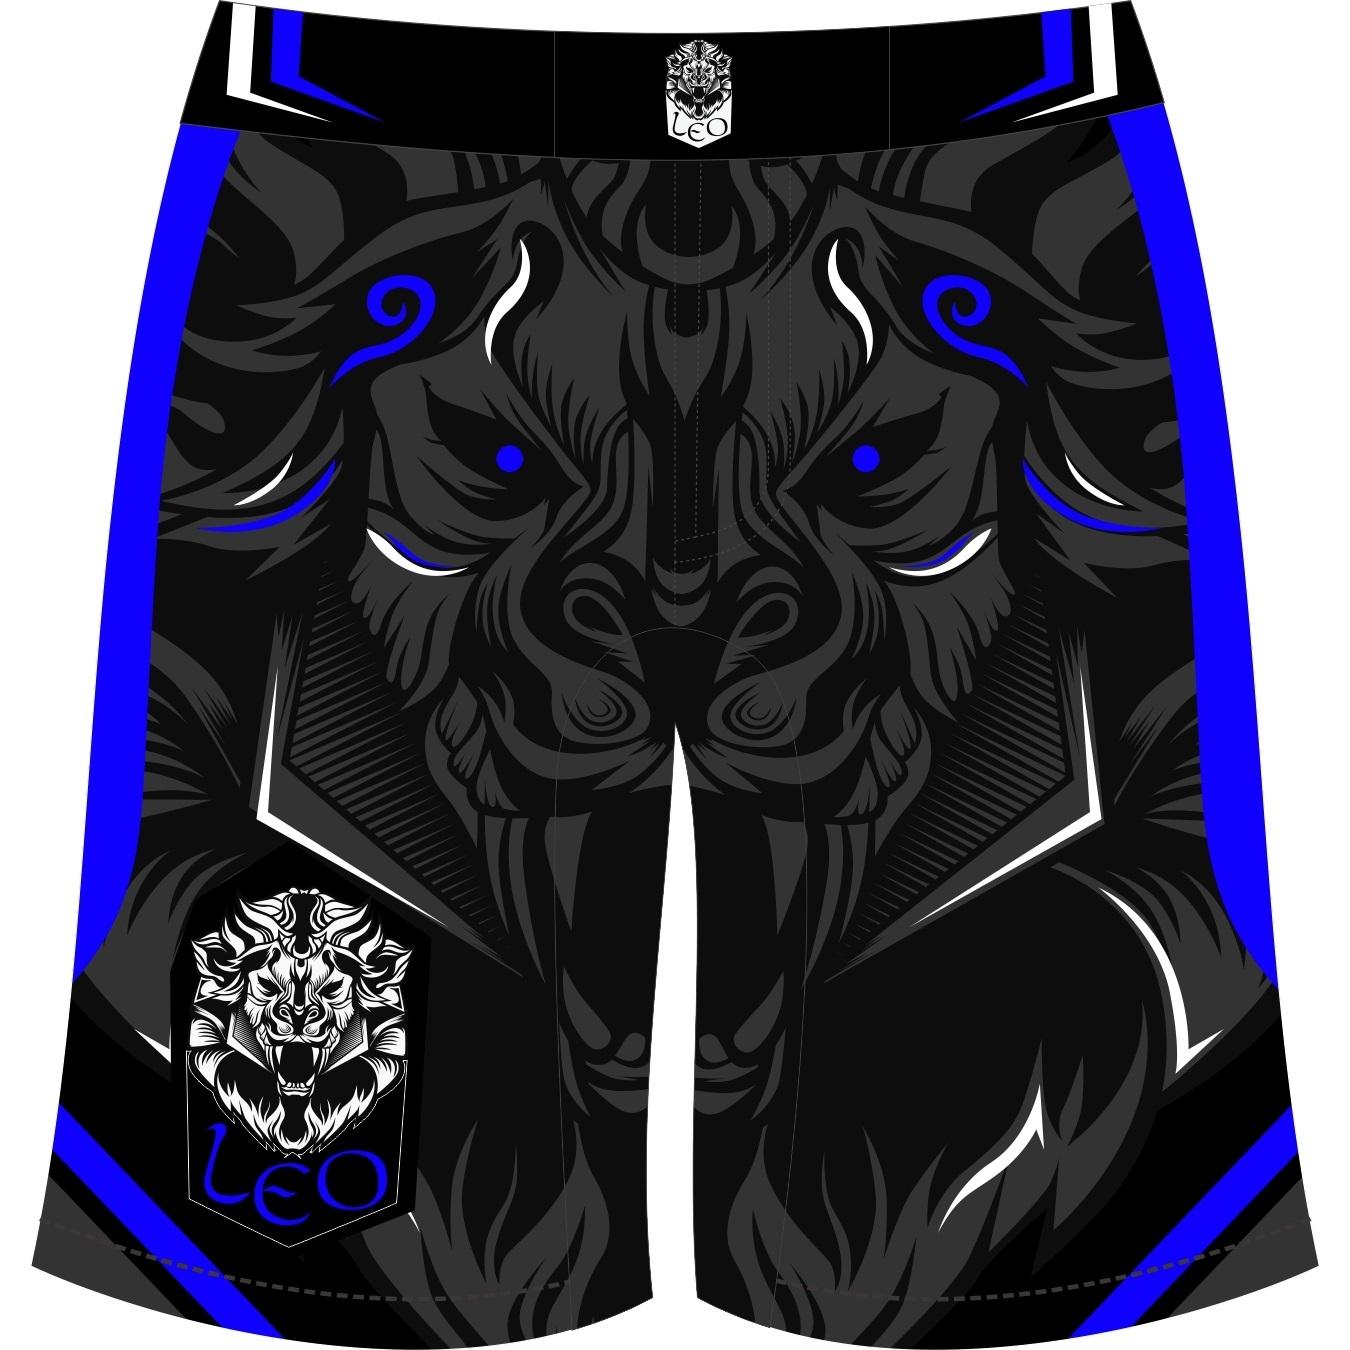 Leo Legend MMA Short - Black/Blue